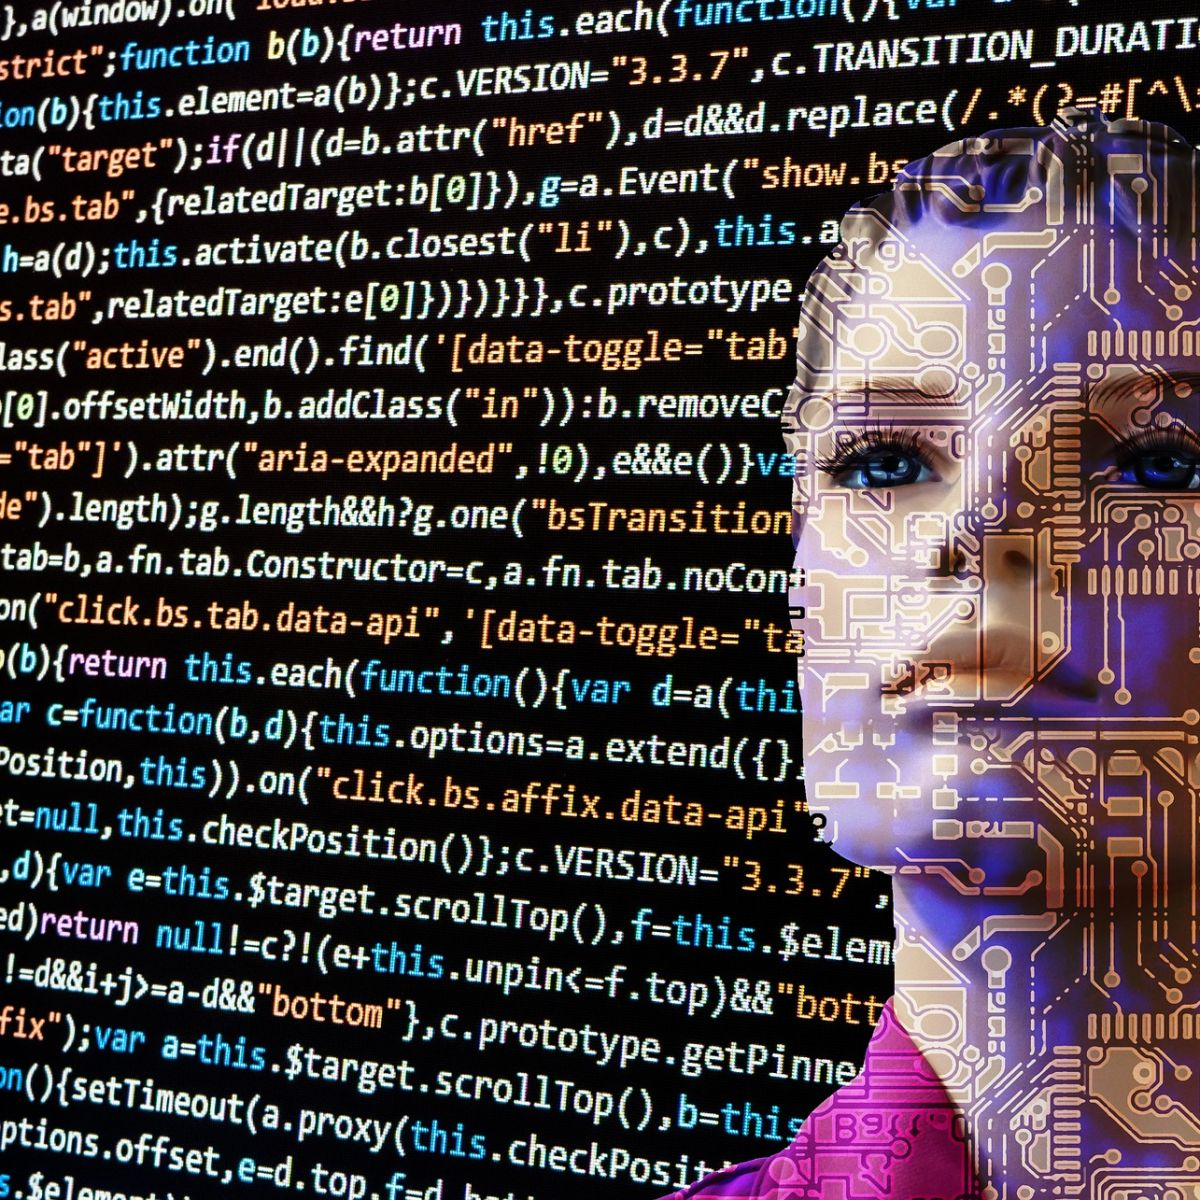 Woman cyborg, ki, ai, artificial intelligence, programming, code, matrix